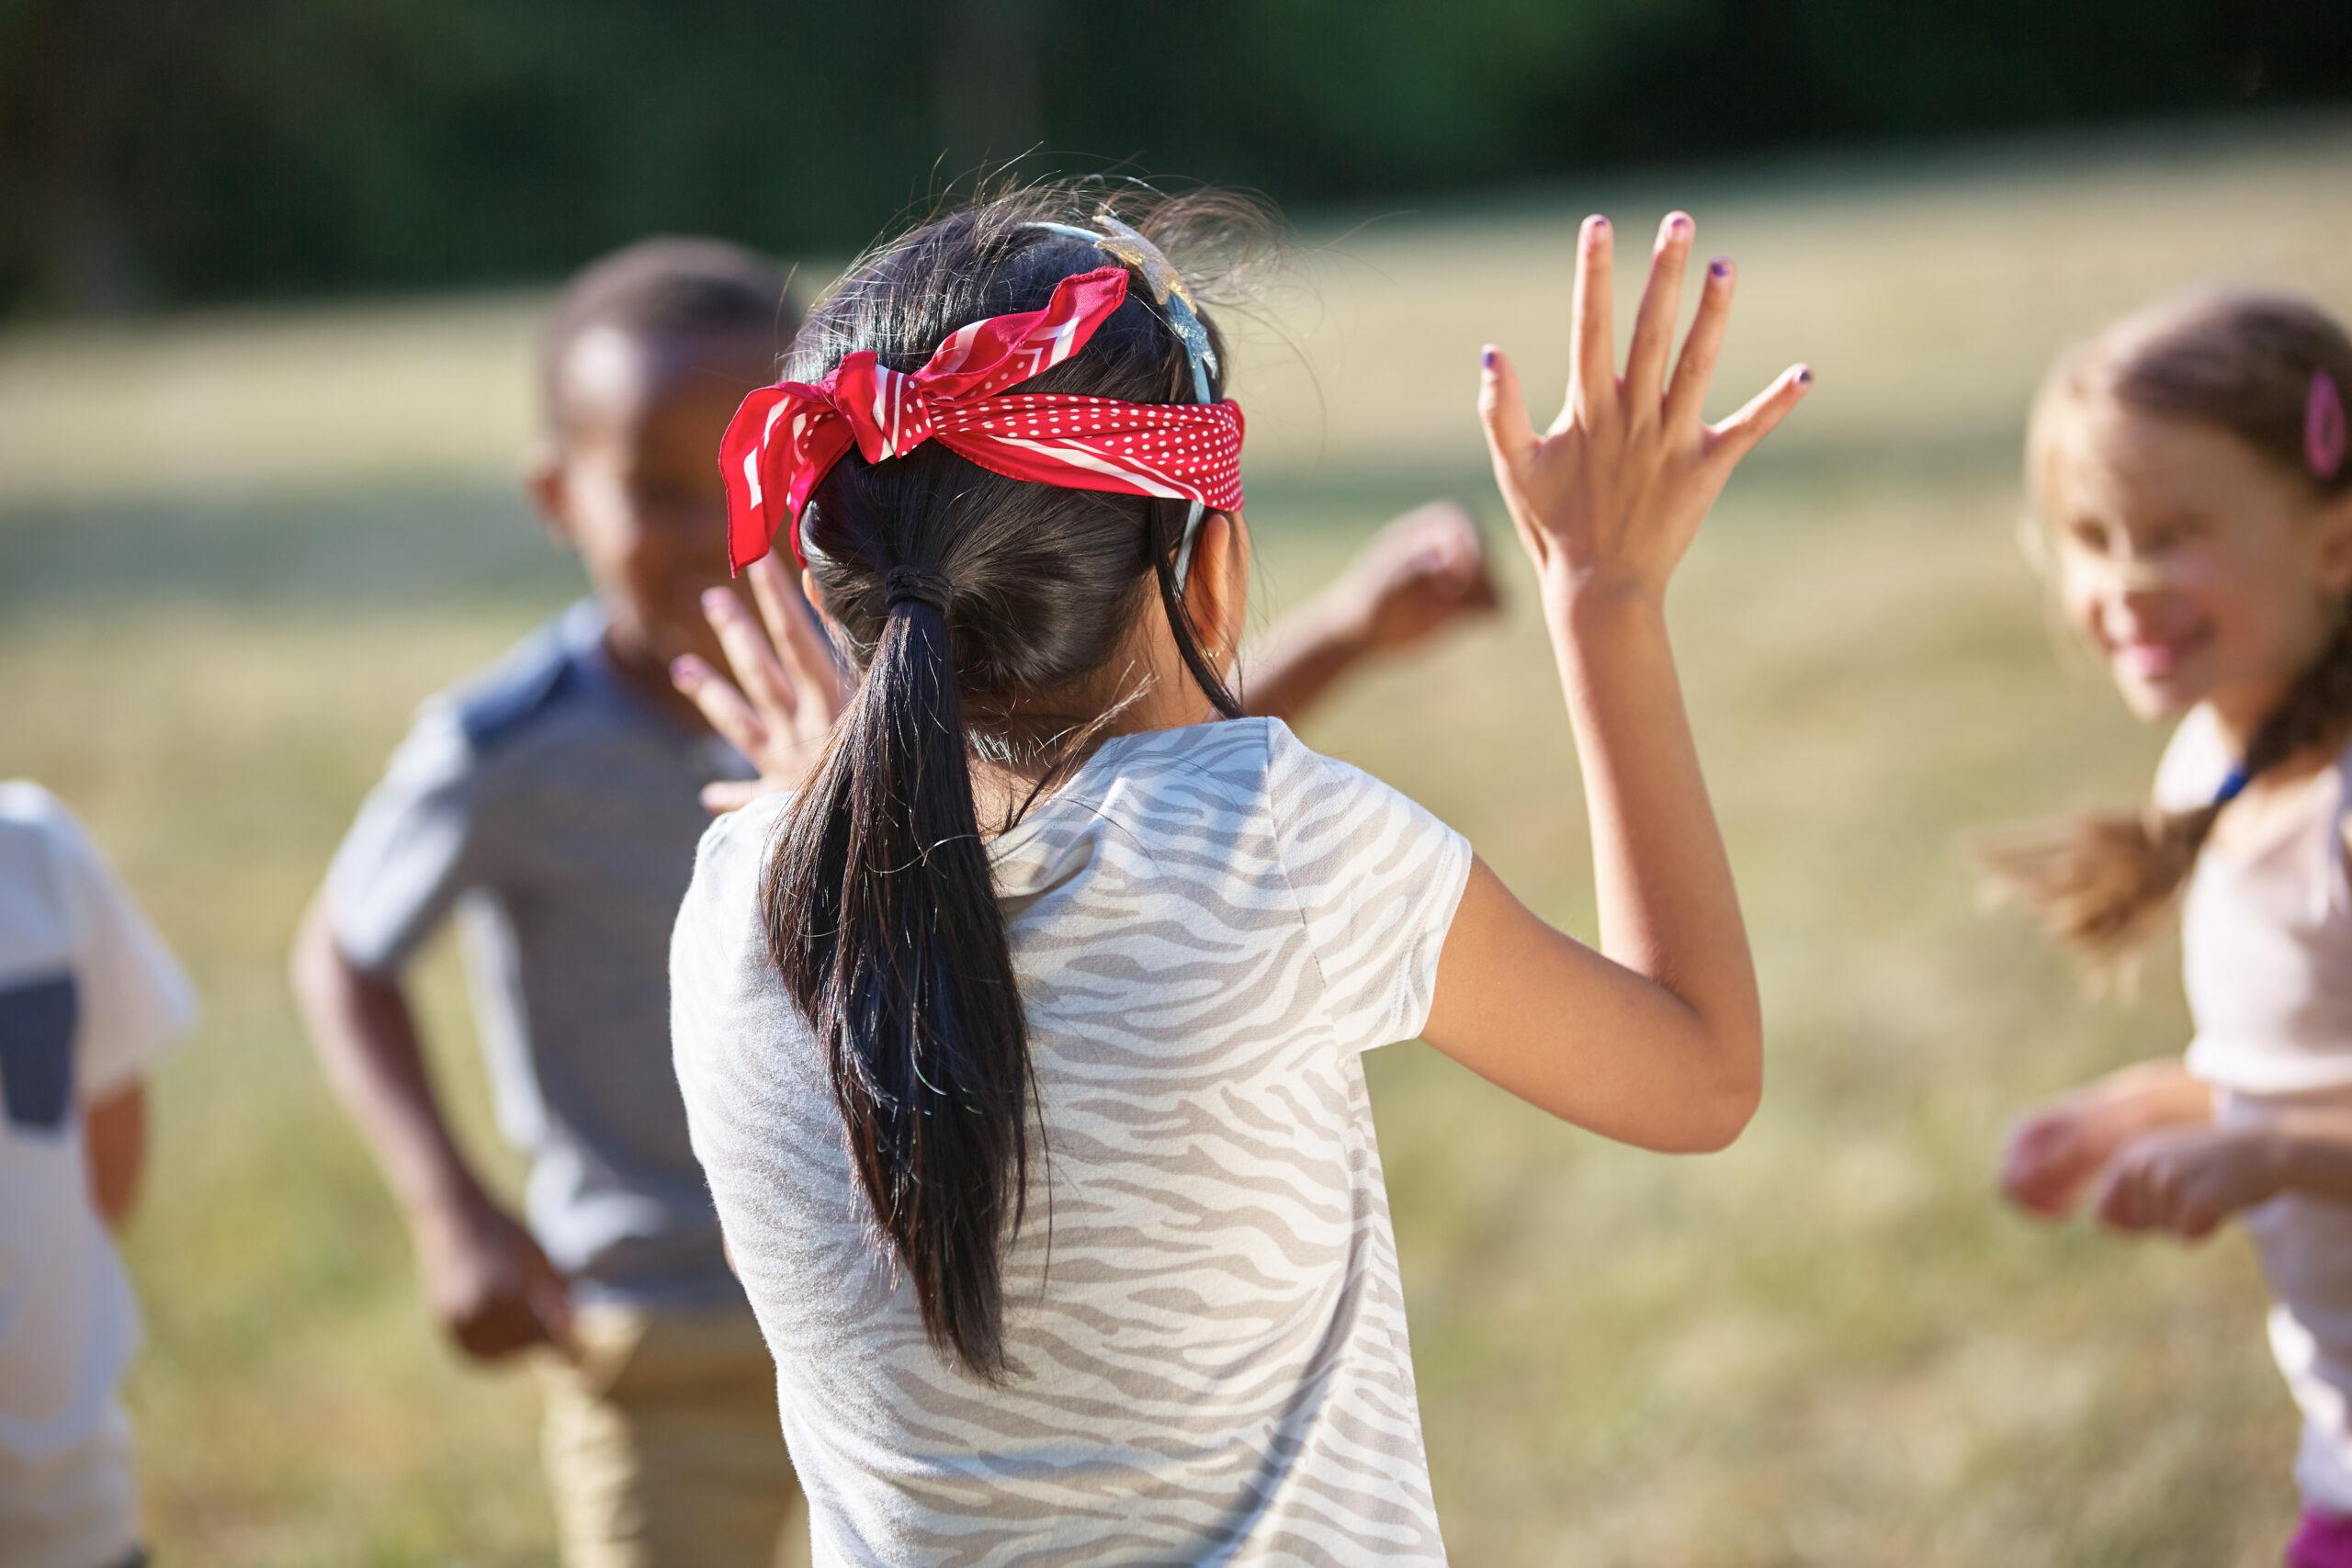 Trustworthiness lesson